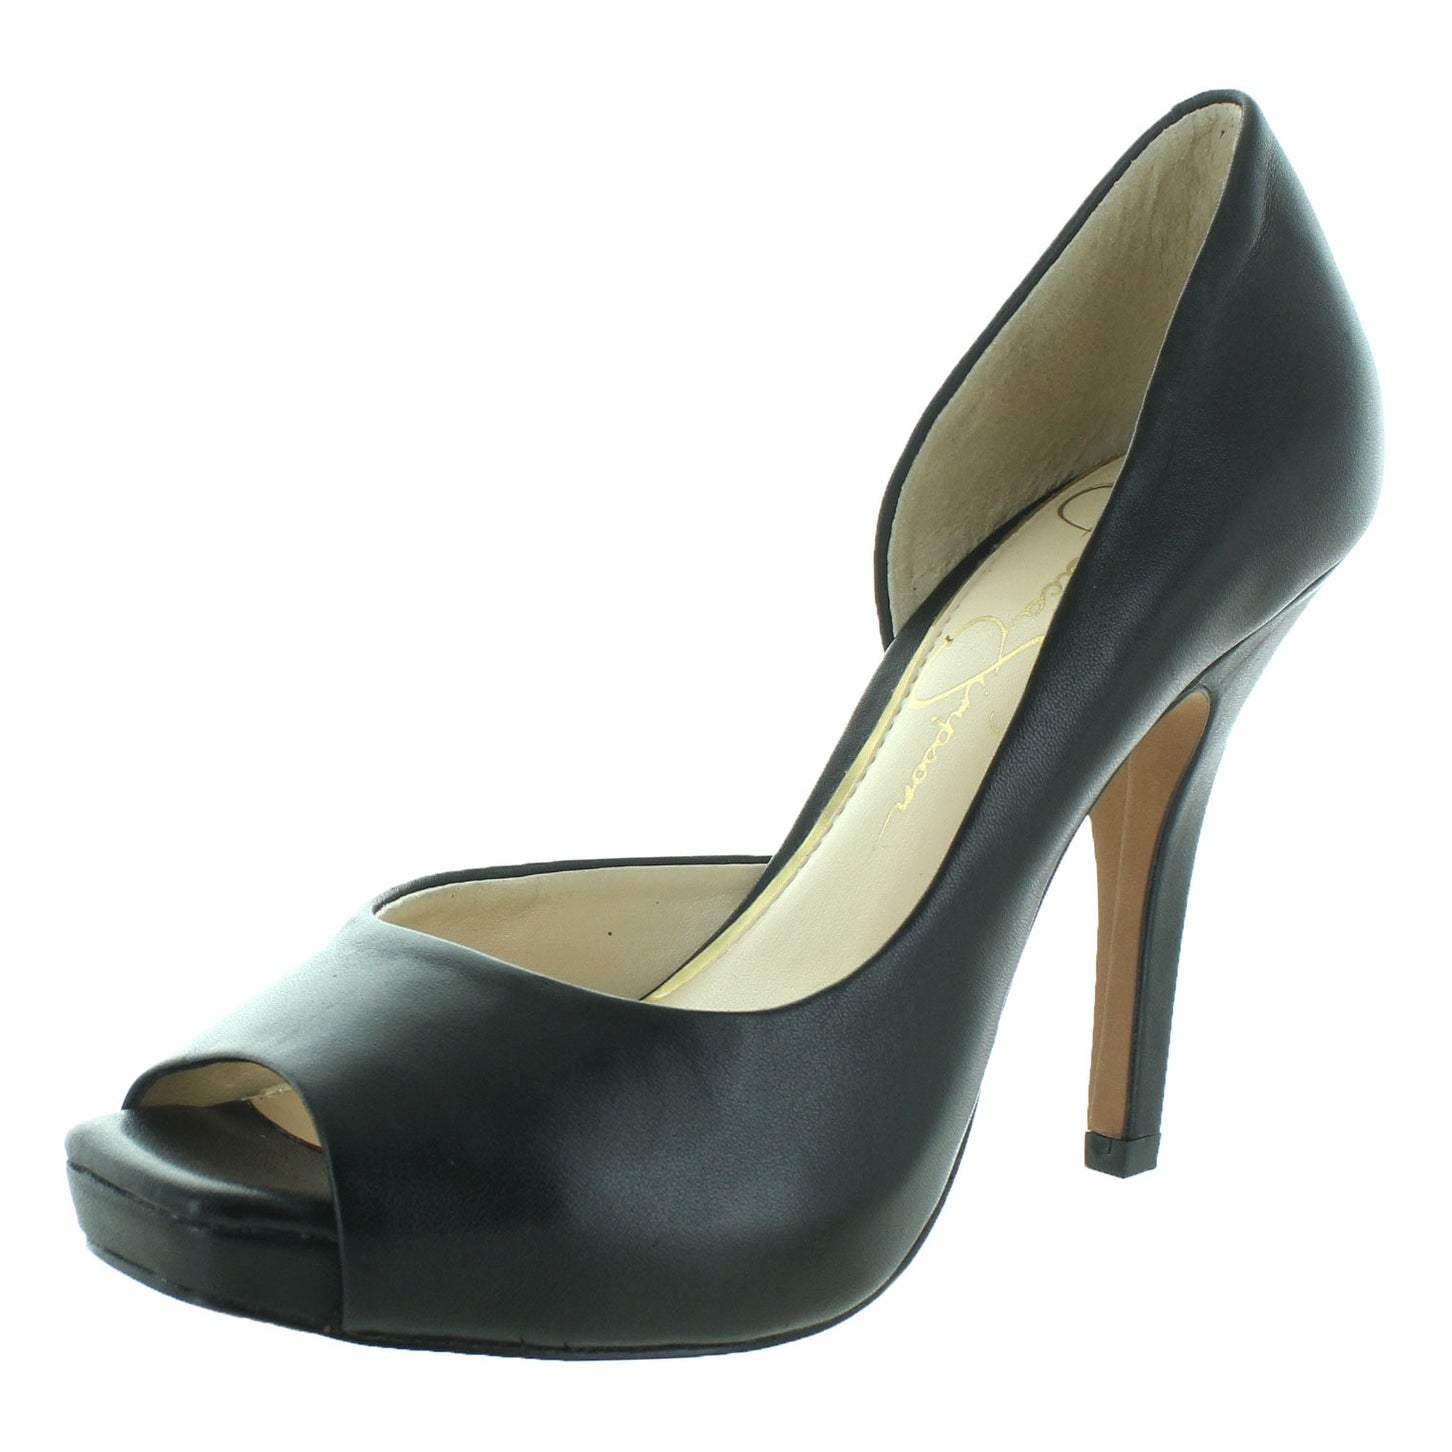 8509cda2addb2 Jessica Simpson Josette D'Orsay Women's Open Toe Heels